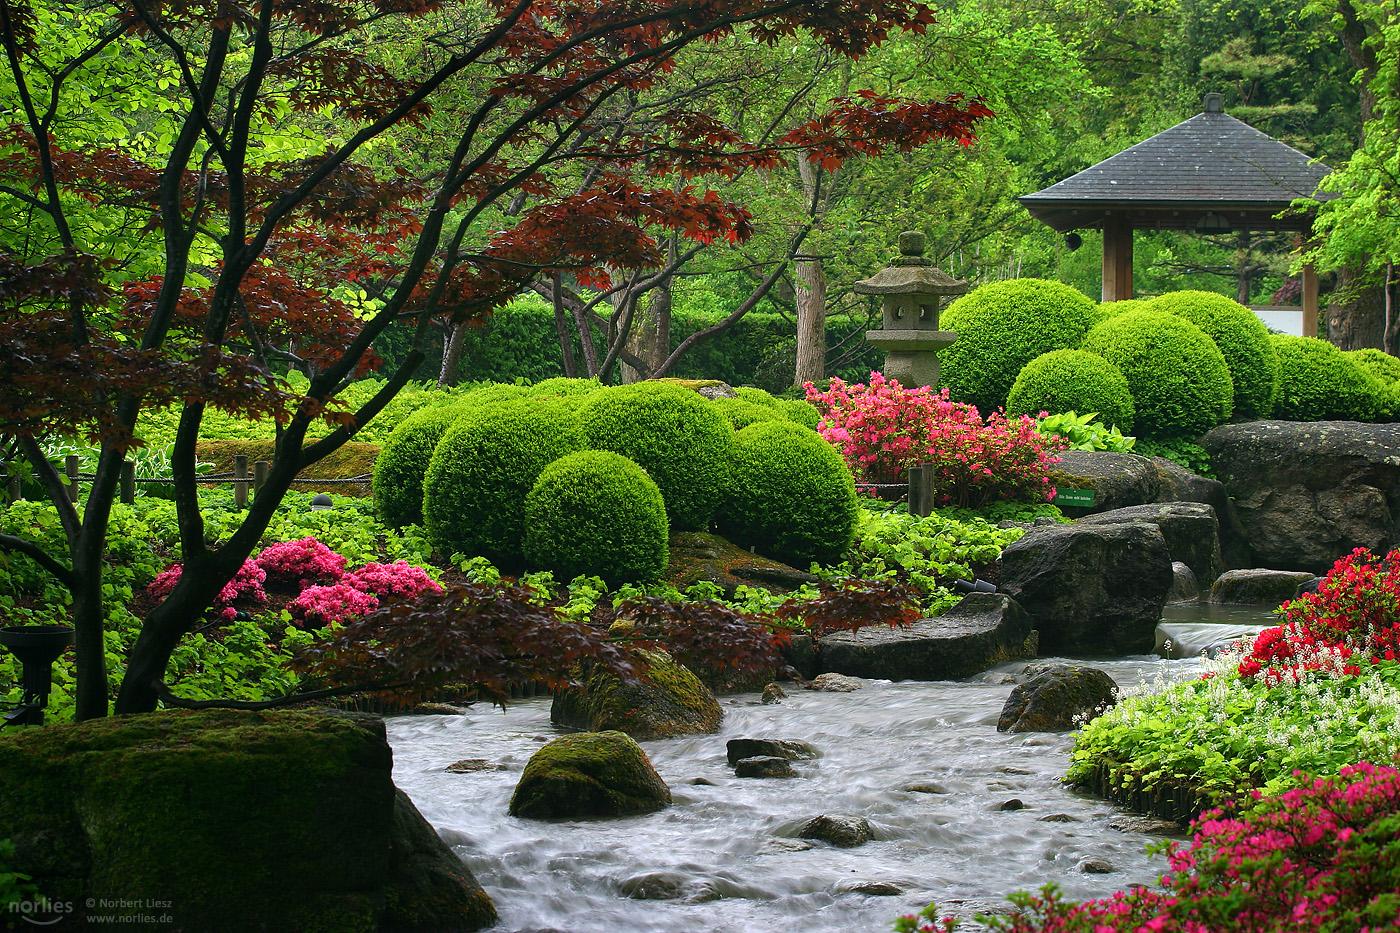 Japanese garden, Germany